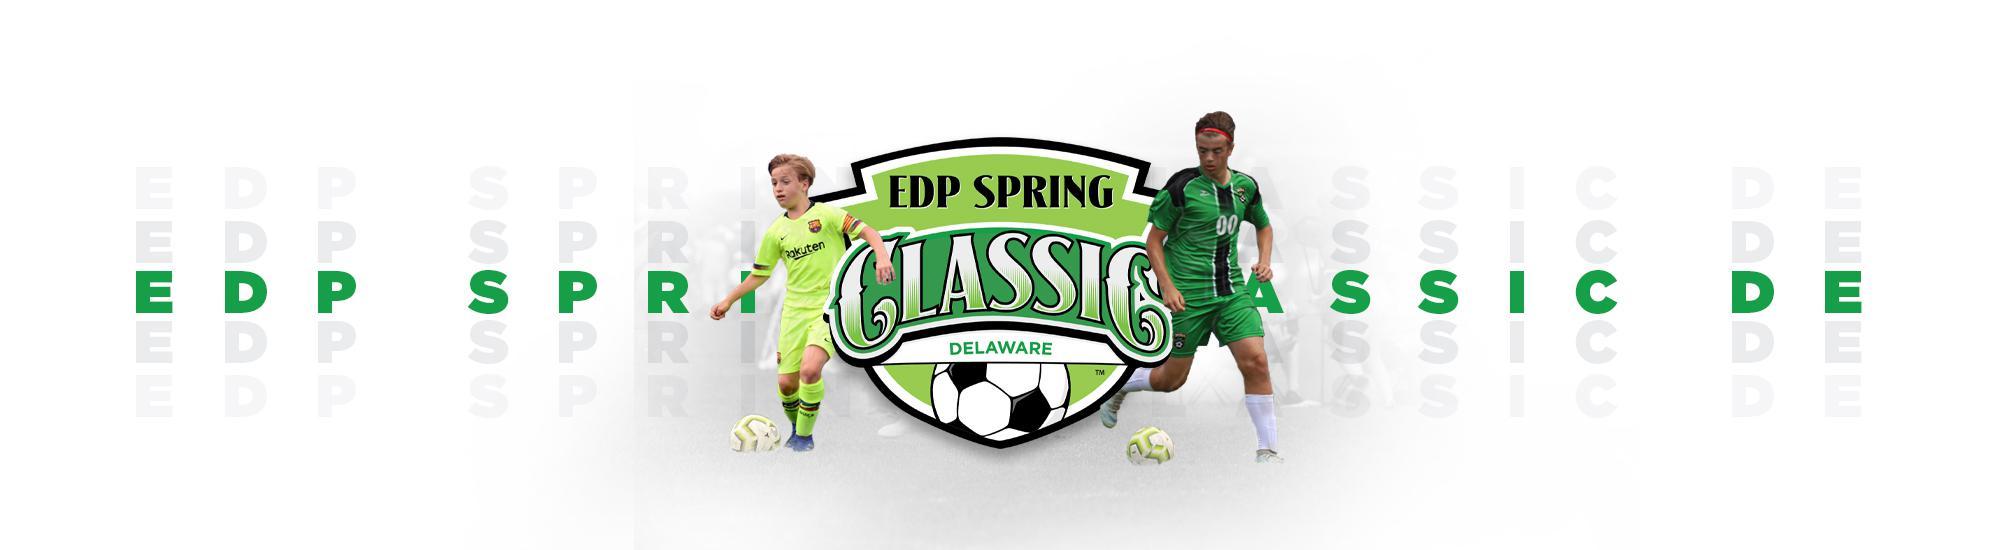 EDP Spring Classic Delaware